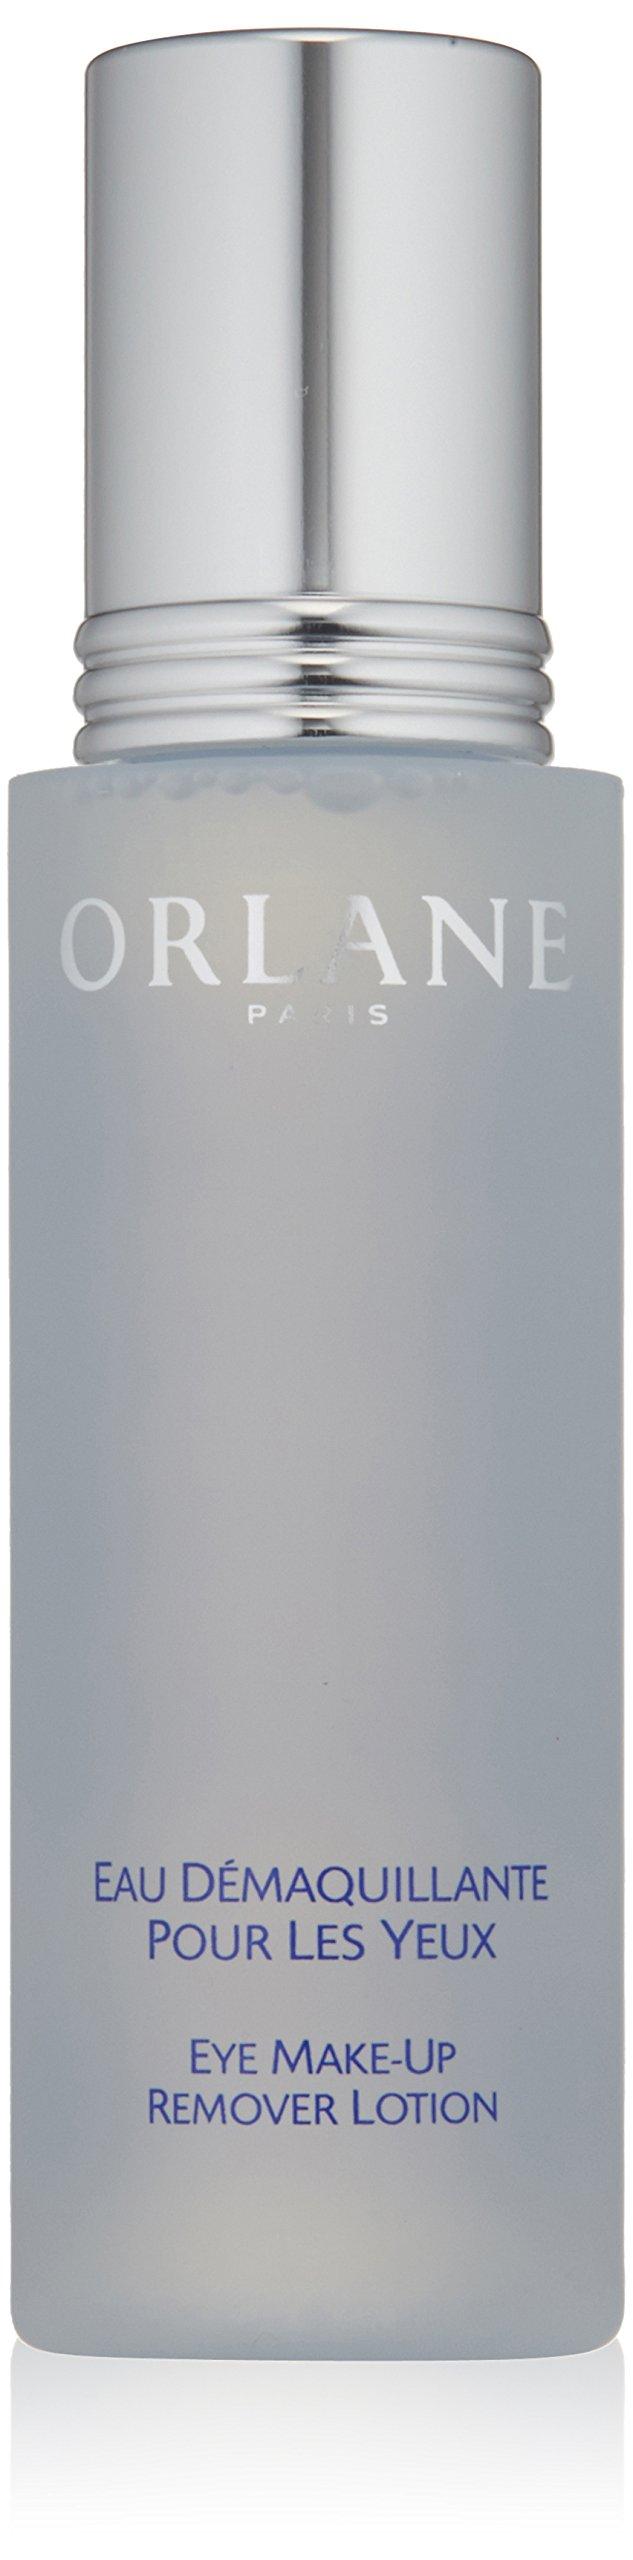 ORLANE PARIS Eye Make-Up Remover Lotion, 3.3 Fl Oz